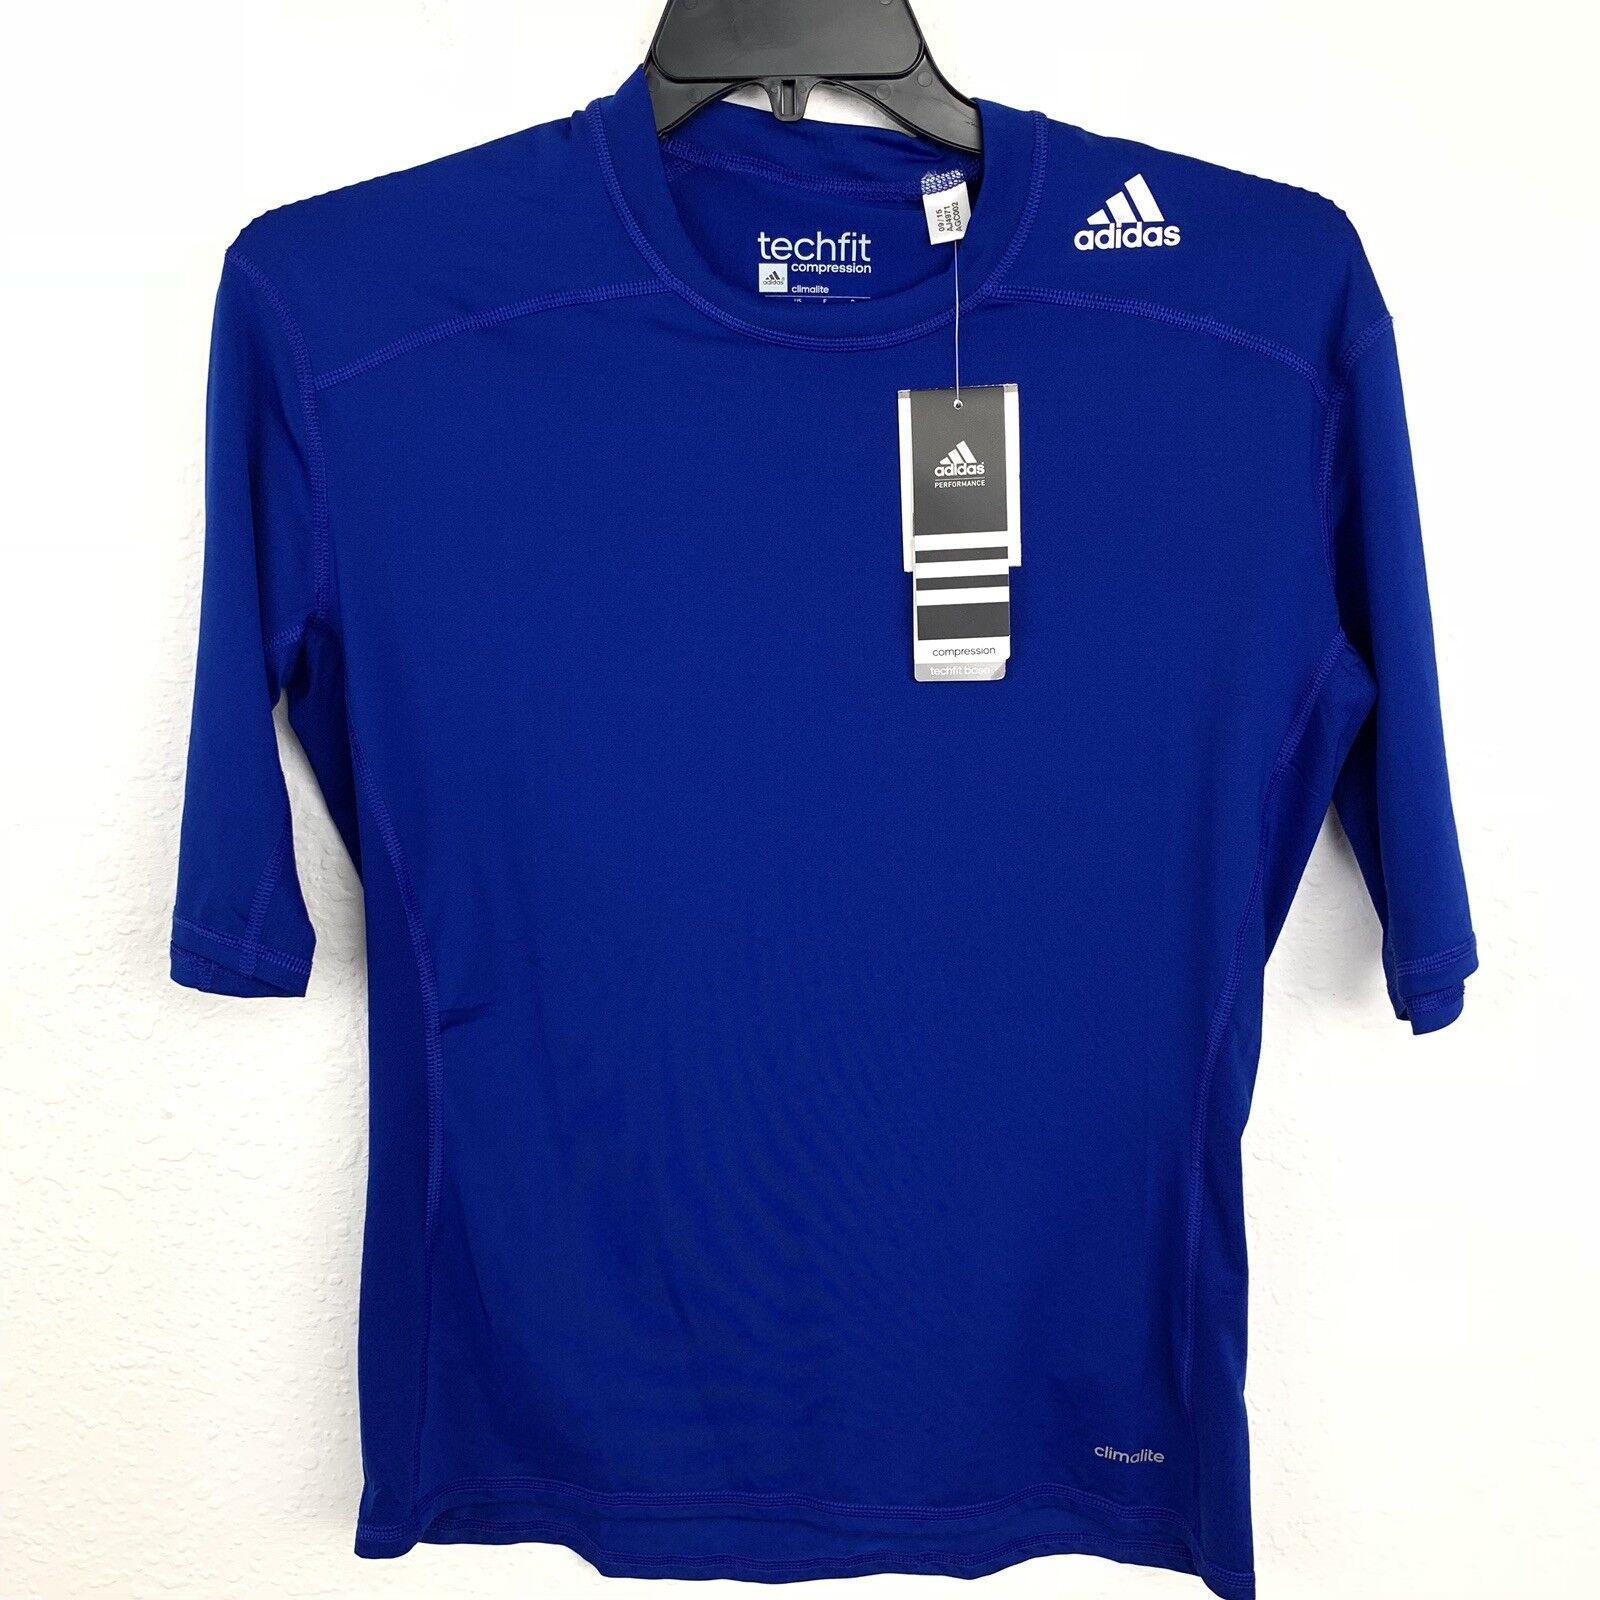 ADIDAS TECHFIT Kompression Climalite Royal Blue Men Tee.Größe XL.NWT.